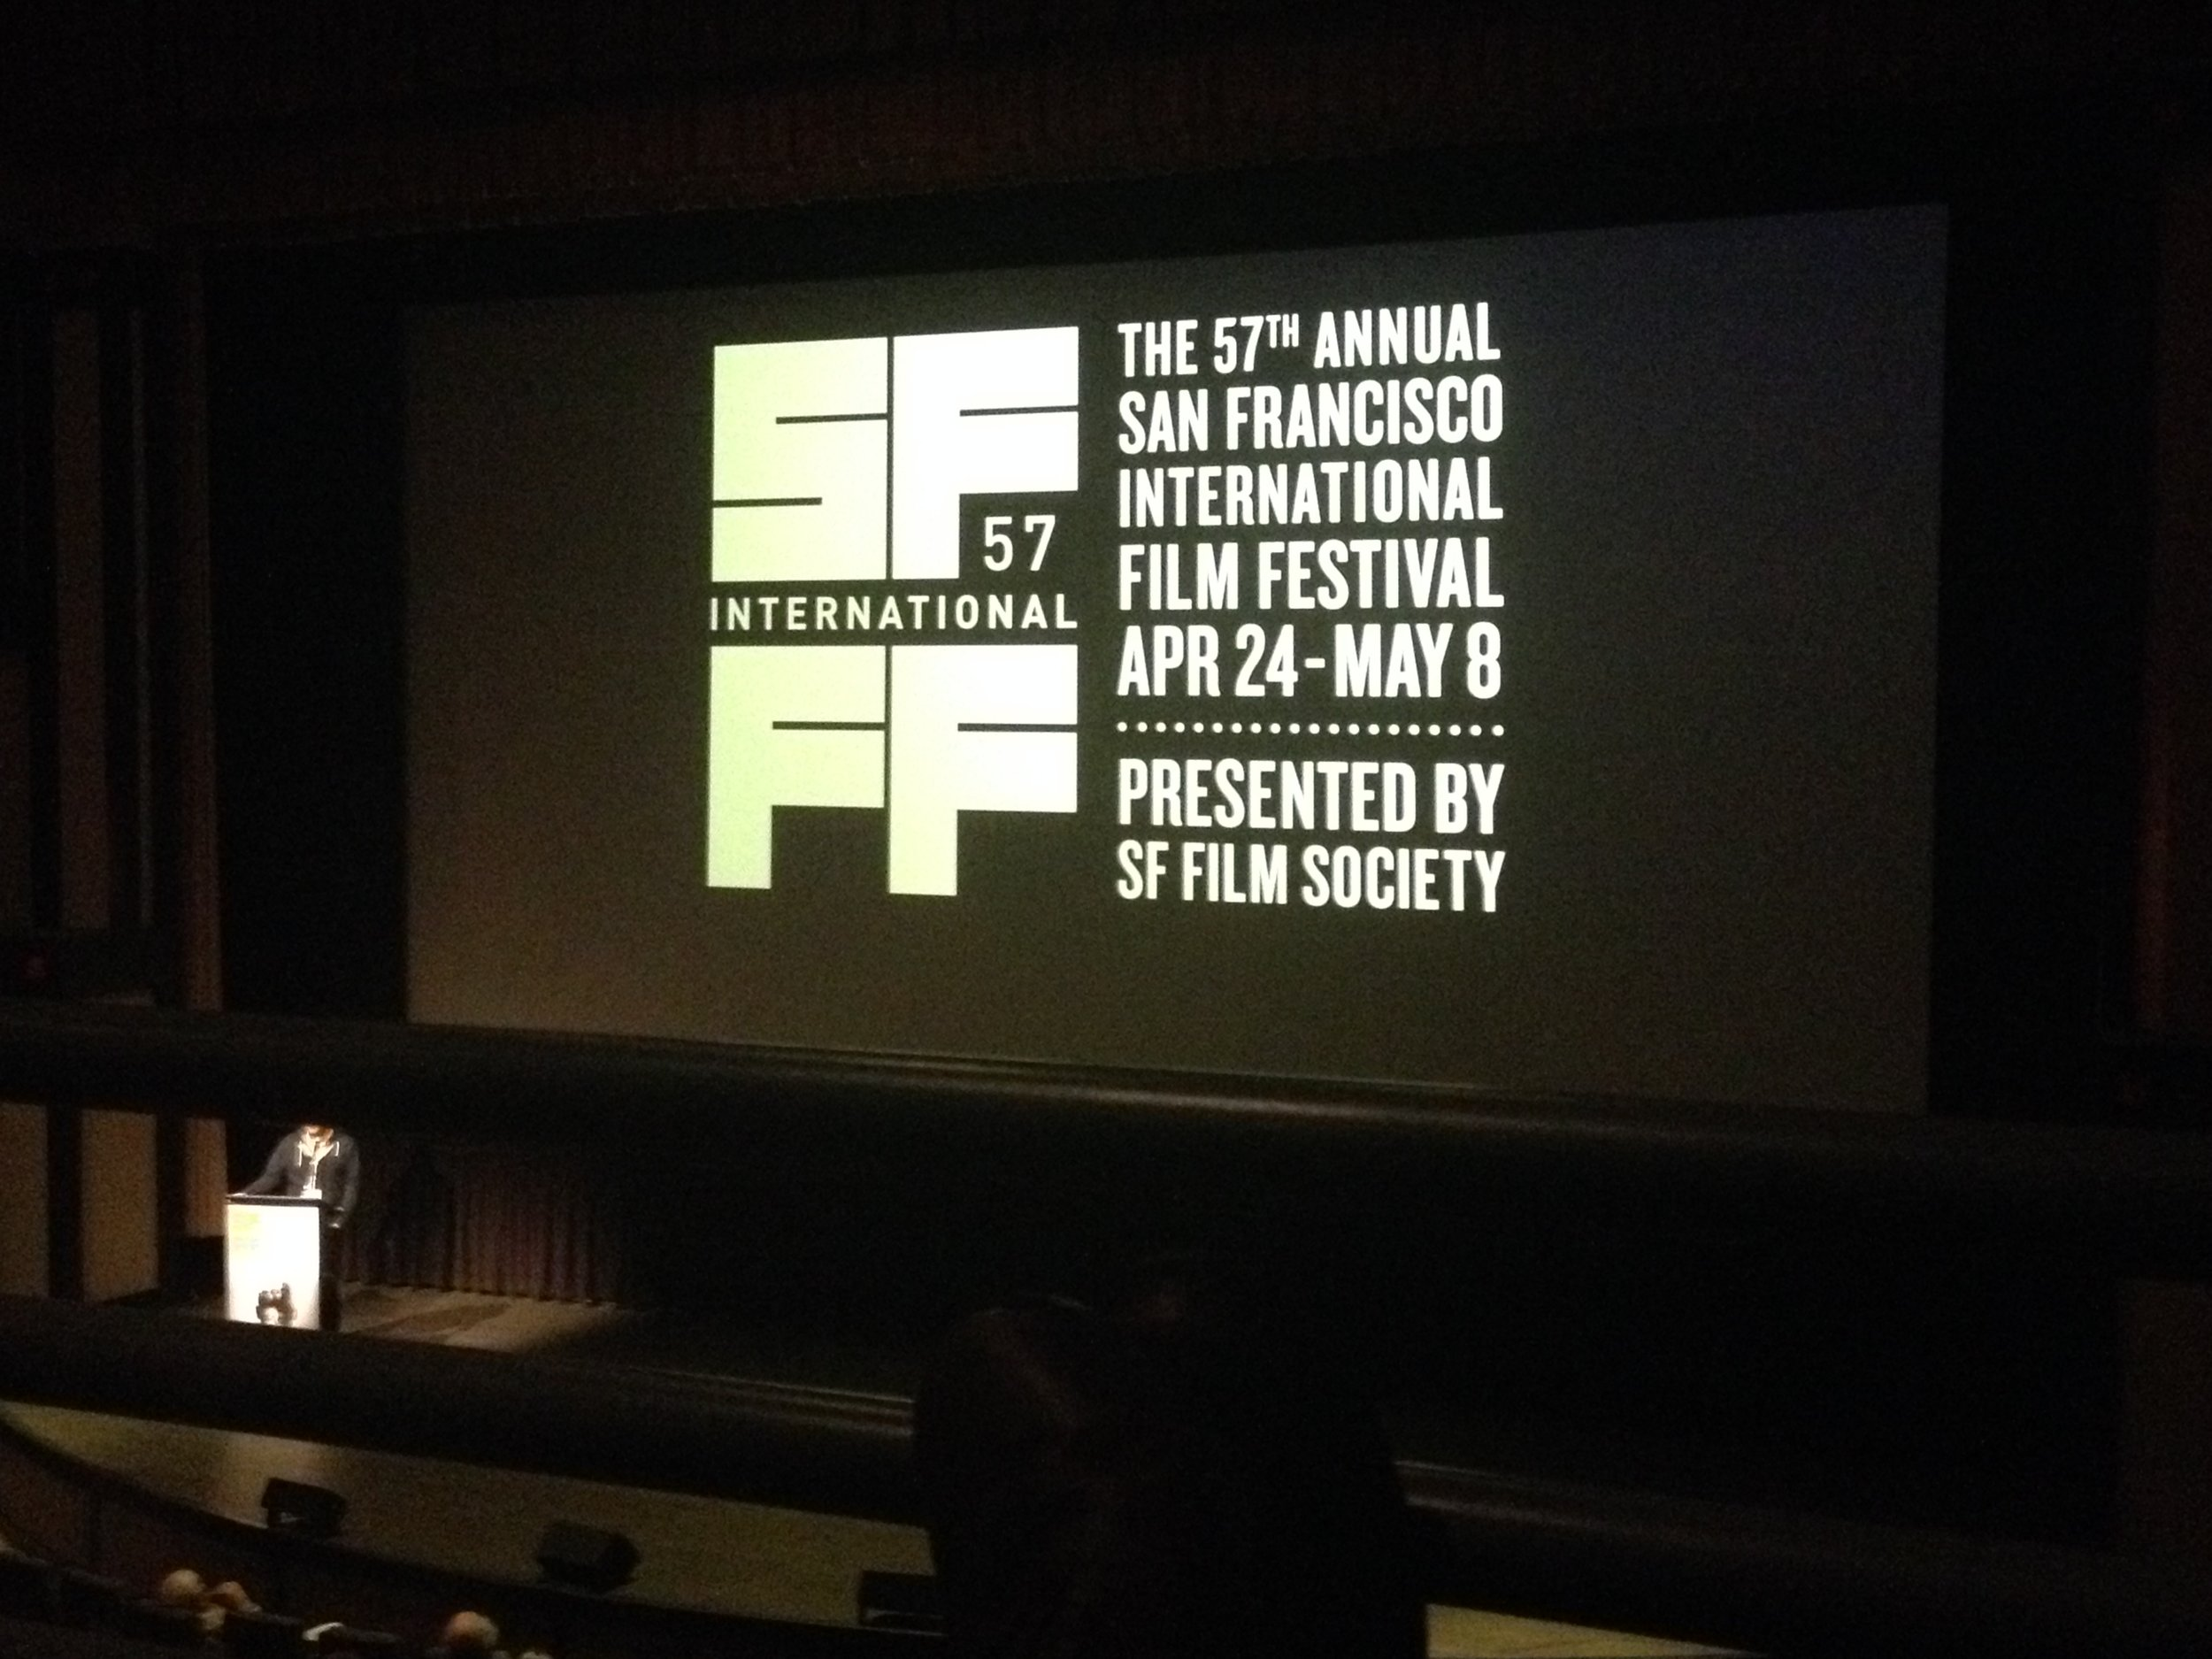 San Francisco International Film Festival!